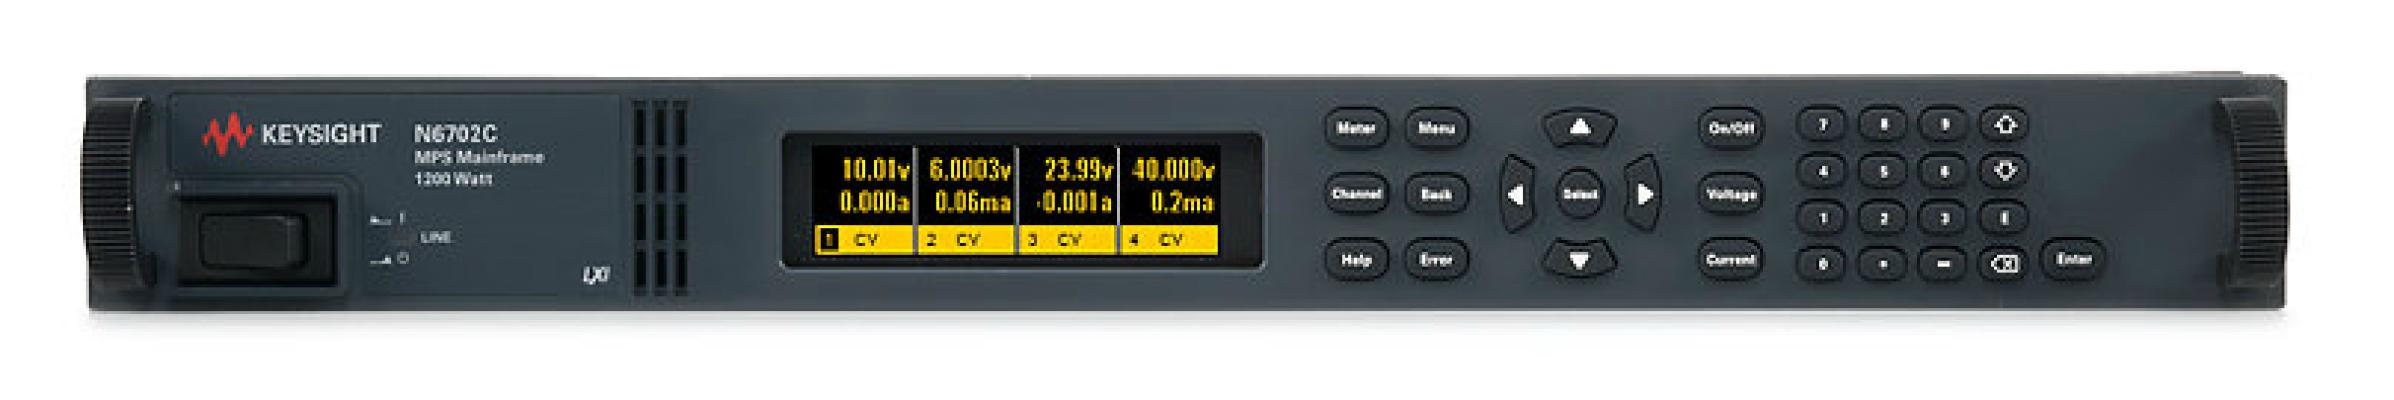 Keysight Low-Profile Modular Power System Mainframe, 1200W, 4 Slots, N6702C